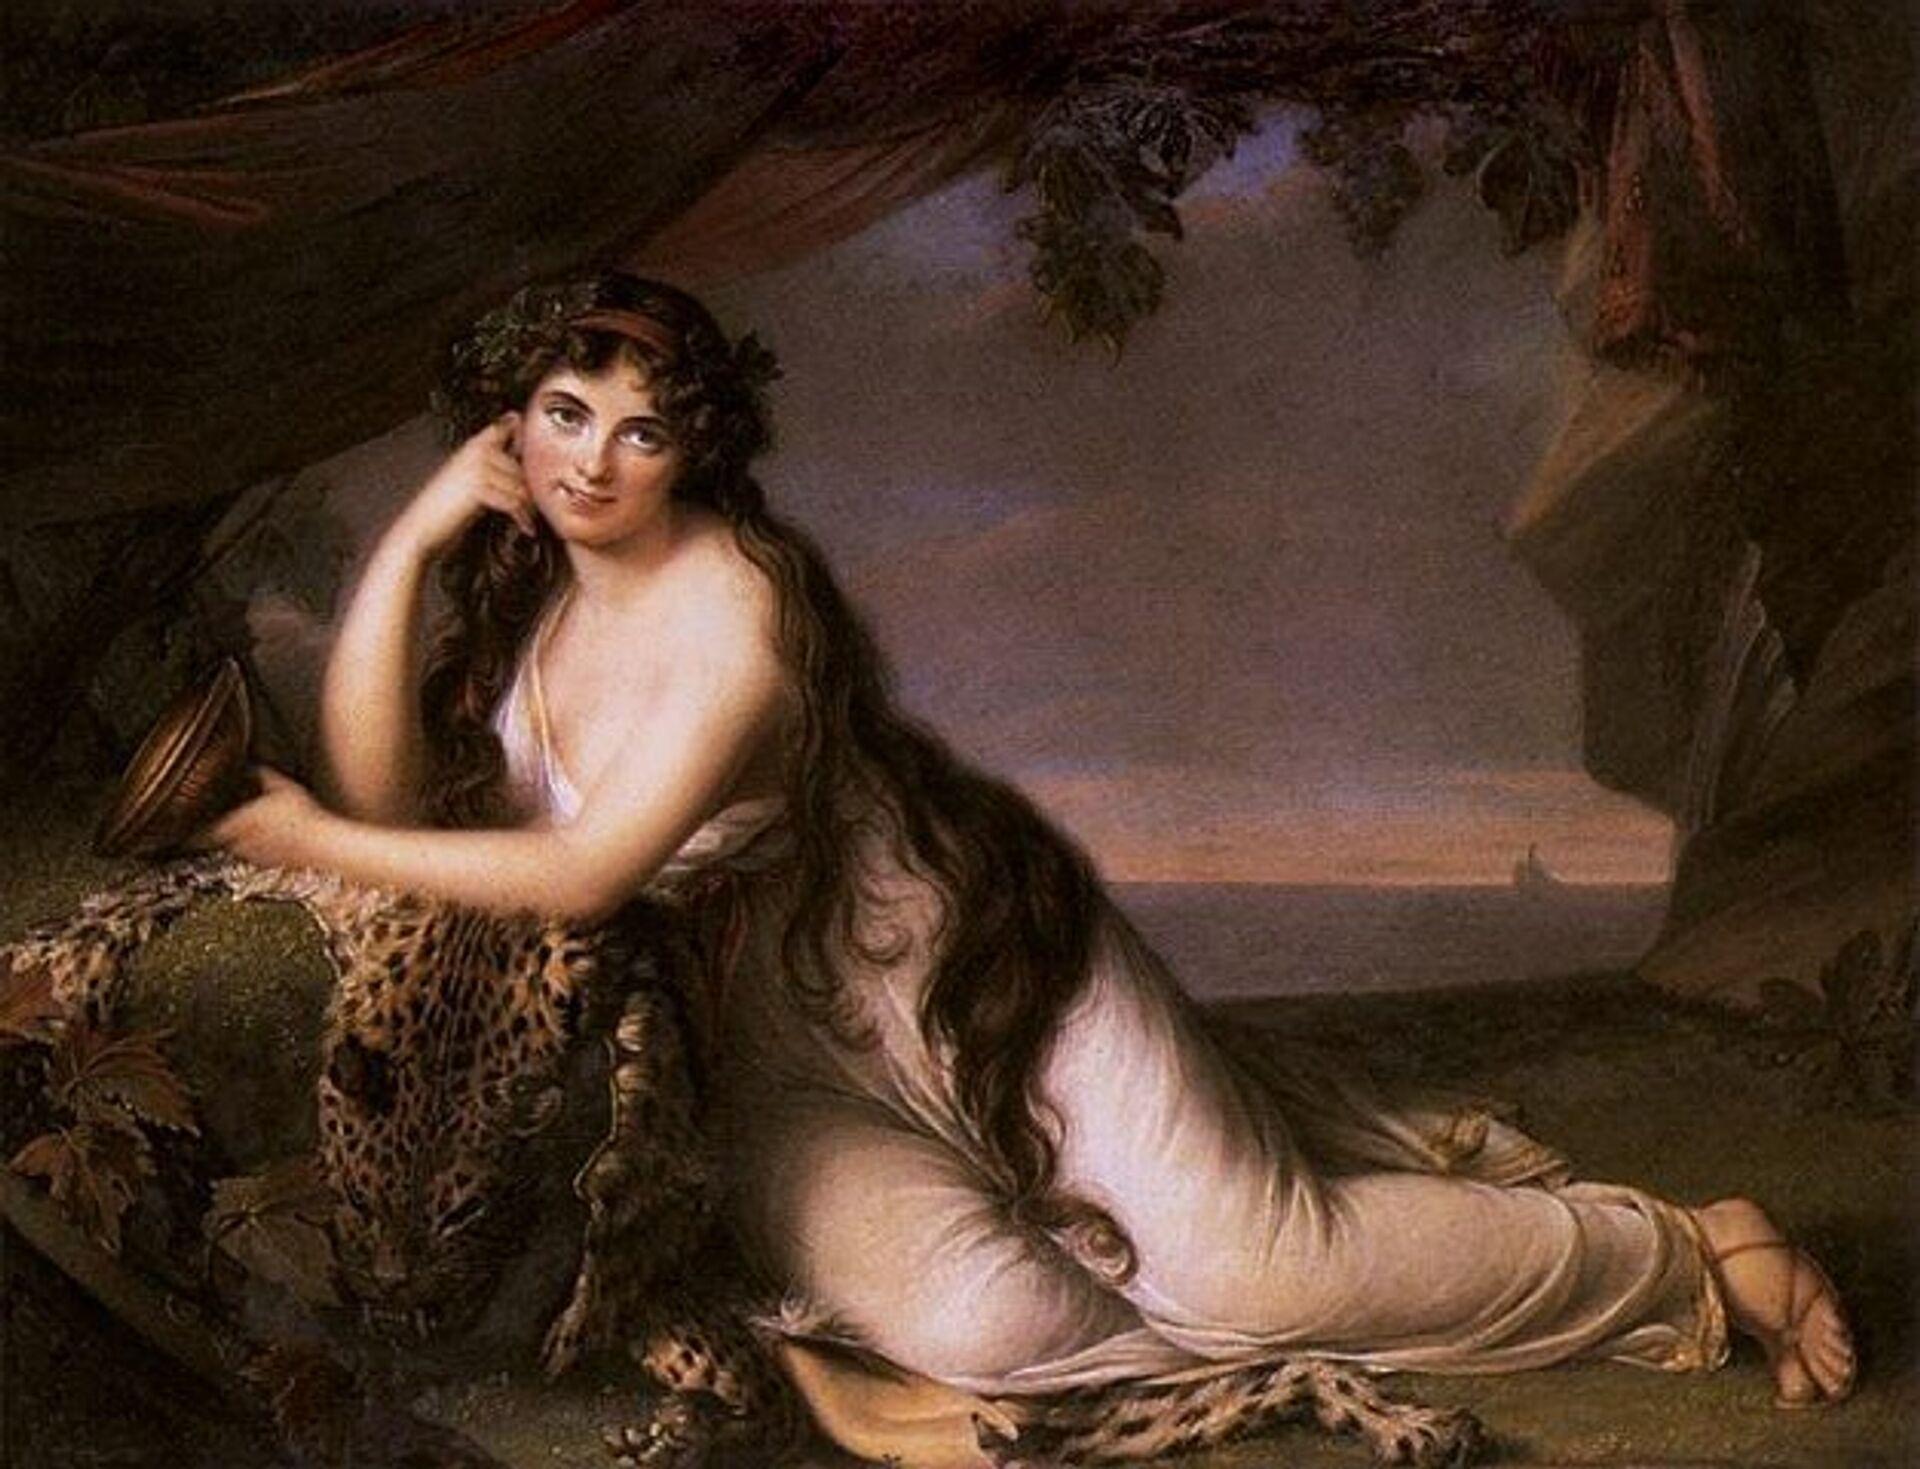 Элизабет Виже-Лебрен. Леди Эмма Гамильтон, 1790 - РИА Новости, 1920, 16.10.2020